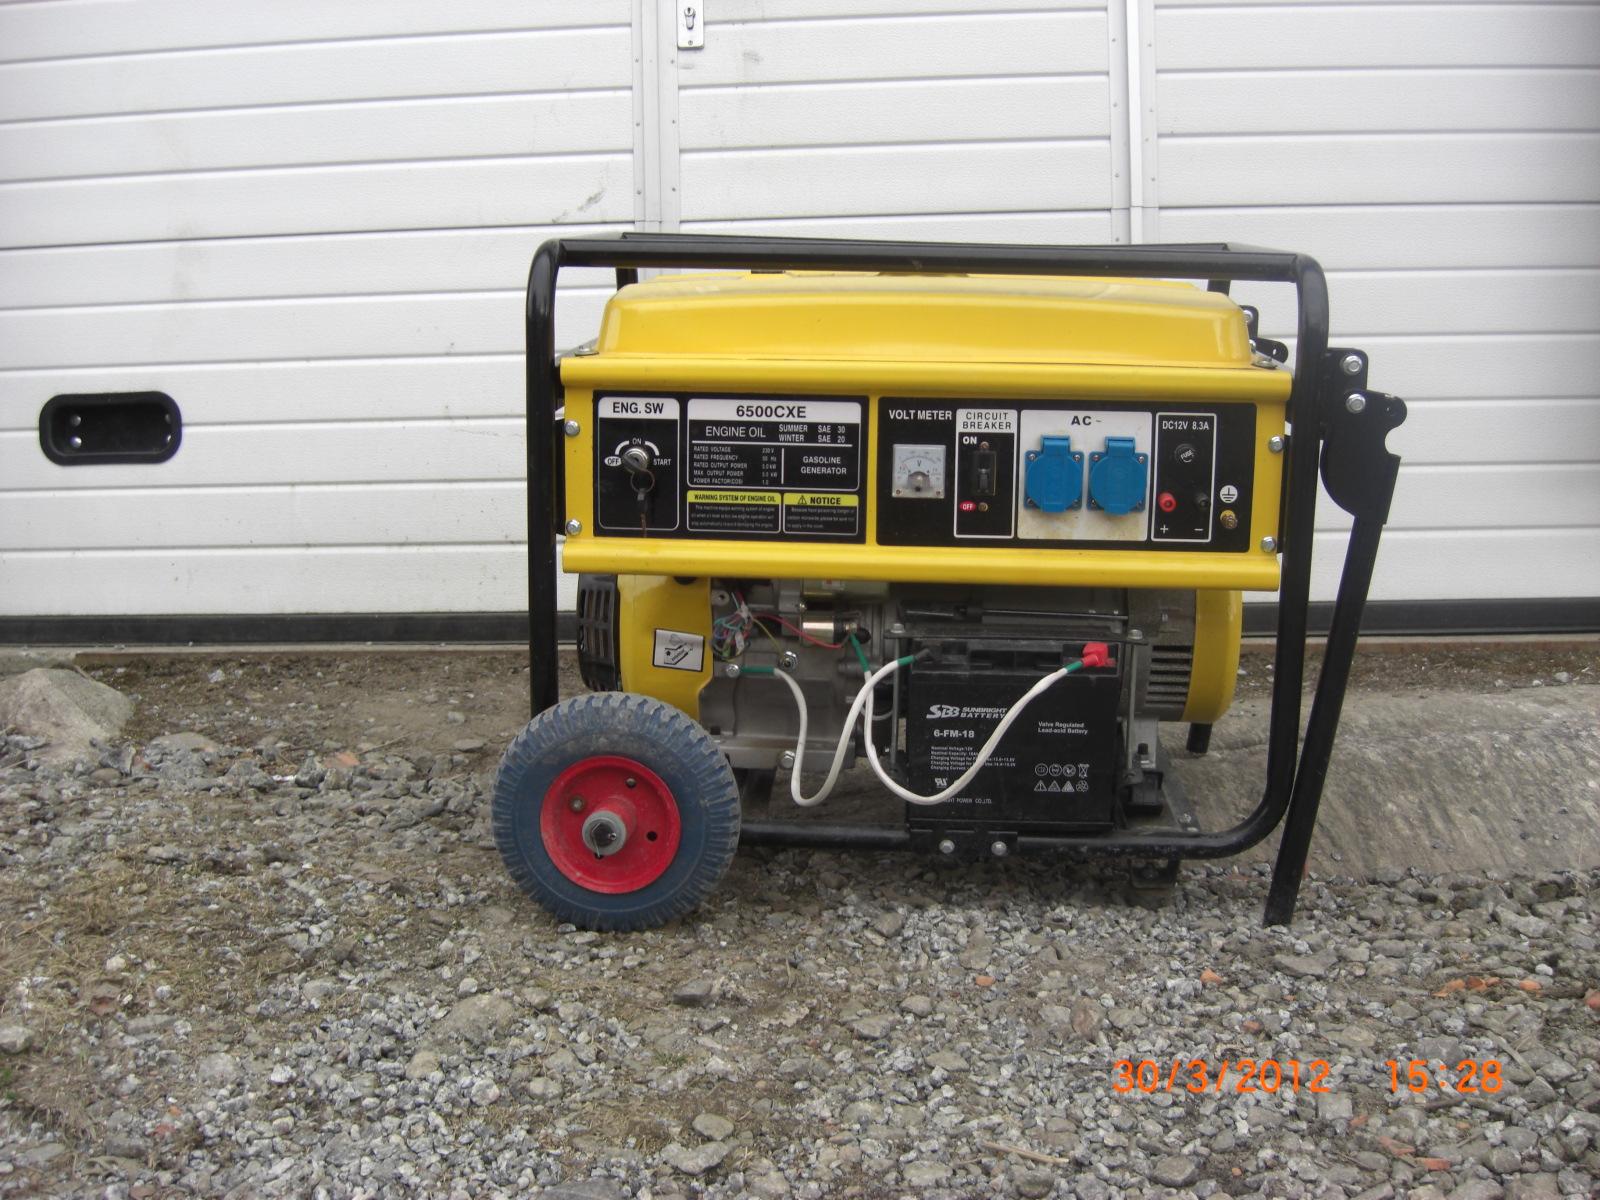 Strømaggregat - Ikke strøm på byggeplassen?Vi har løsningen!